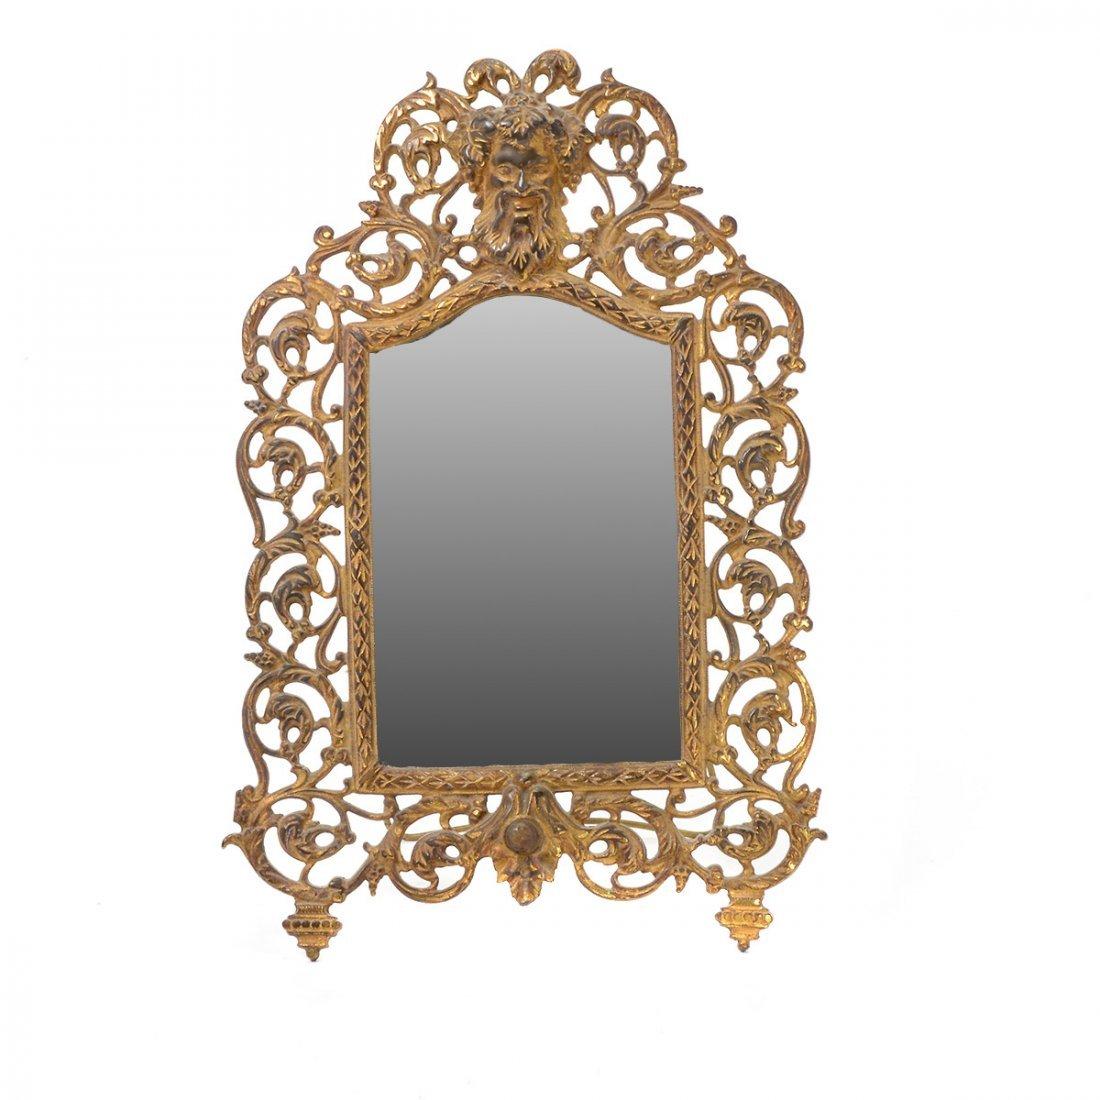 Bradley & Hubbard Renaissance Style Gilt Dresser Mirror - 3